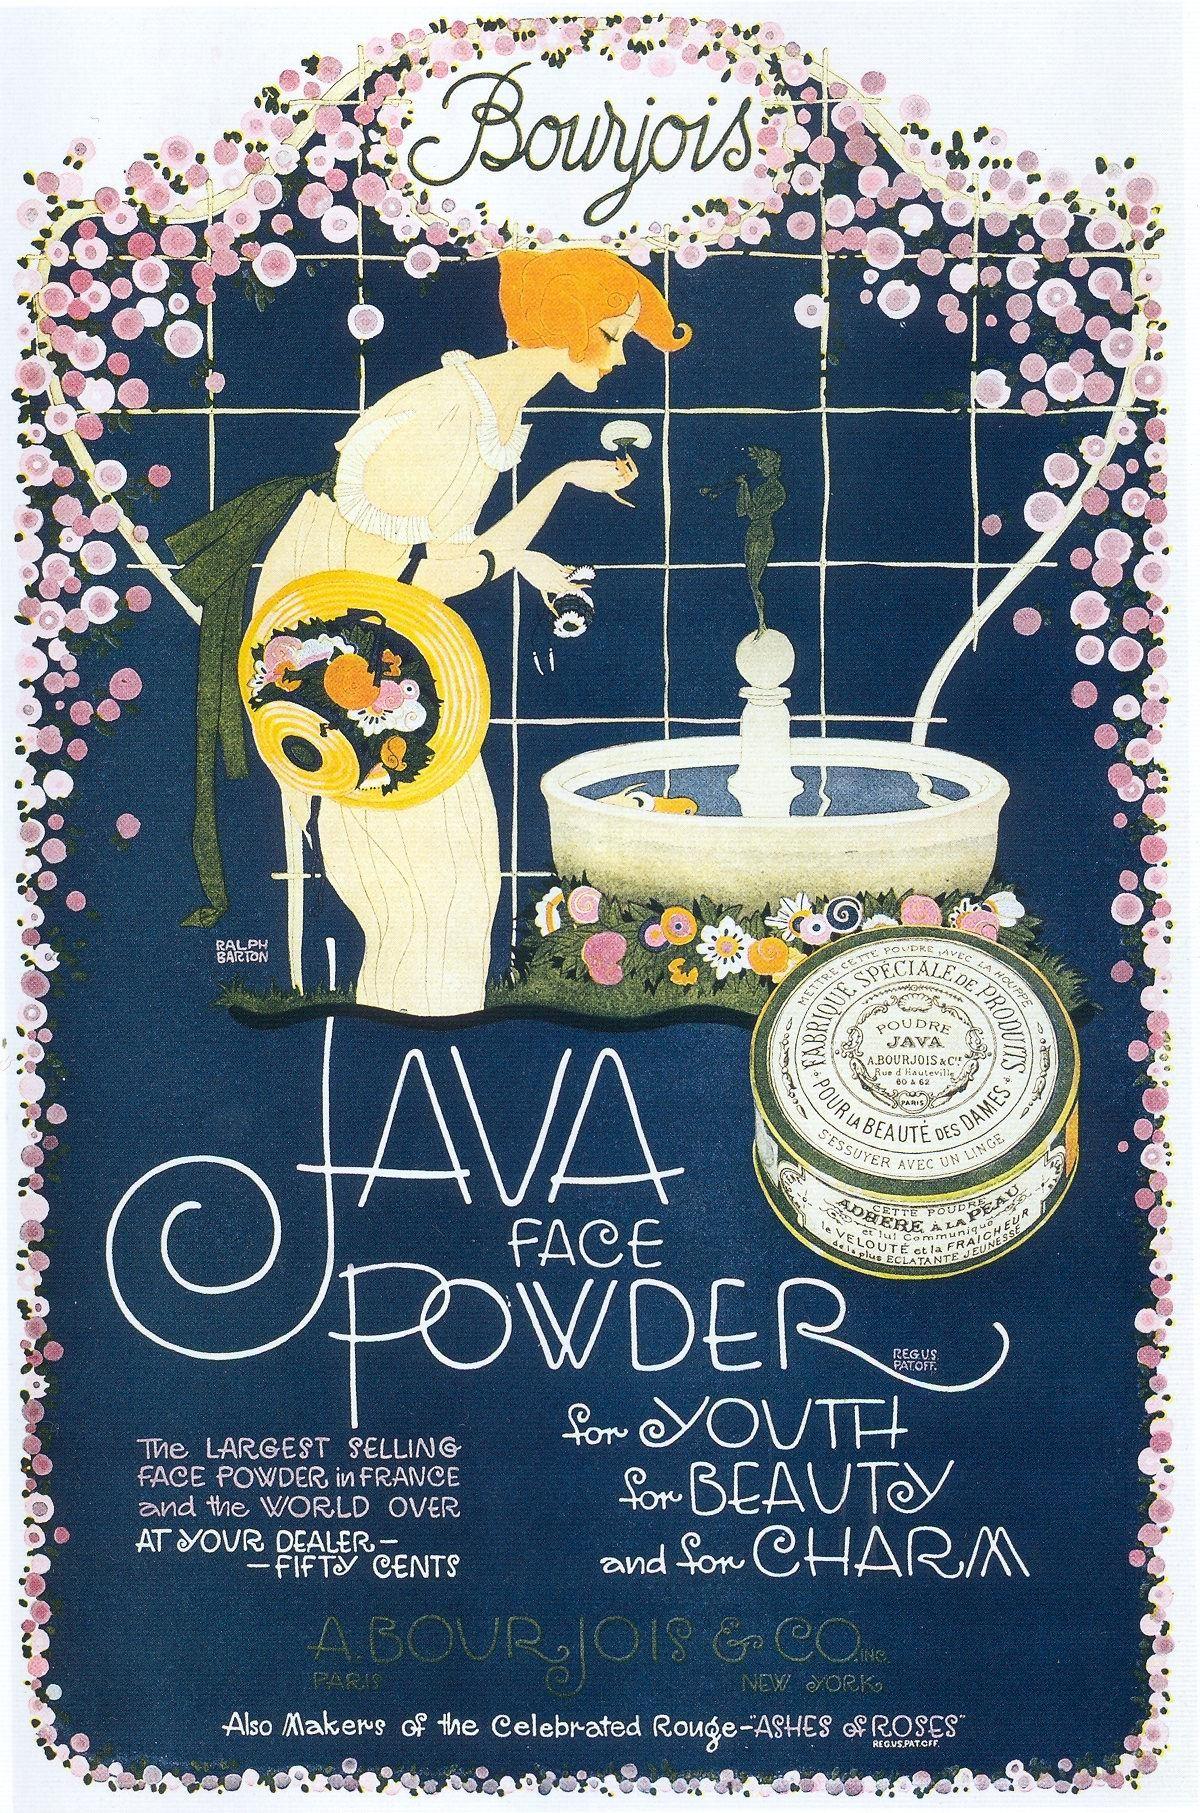 Java Face Powder (1919) Ralph Barton